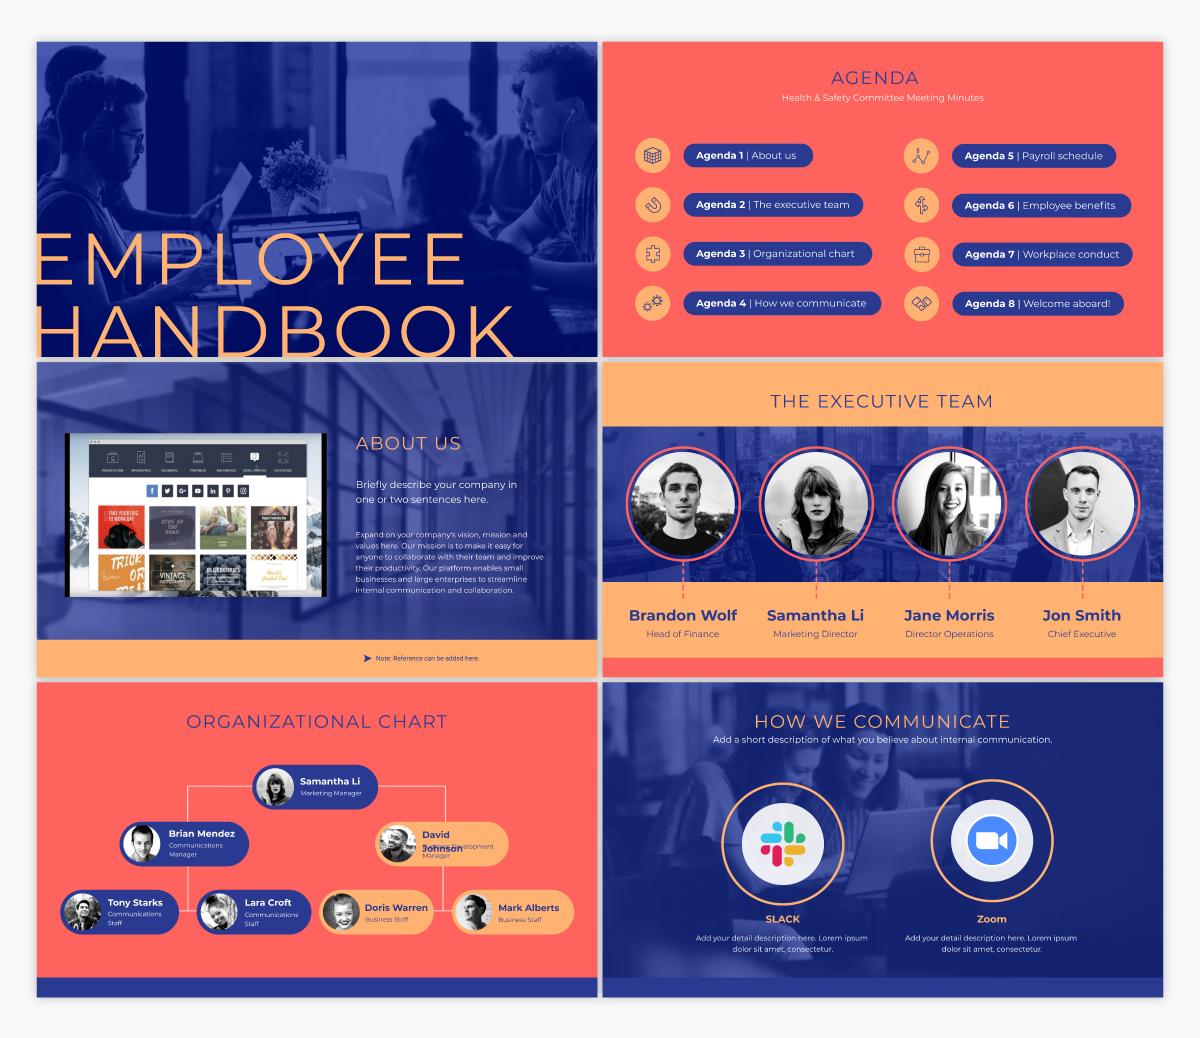 An employee handbook presentation template available in Visme.